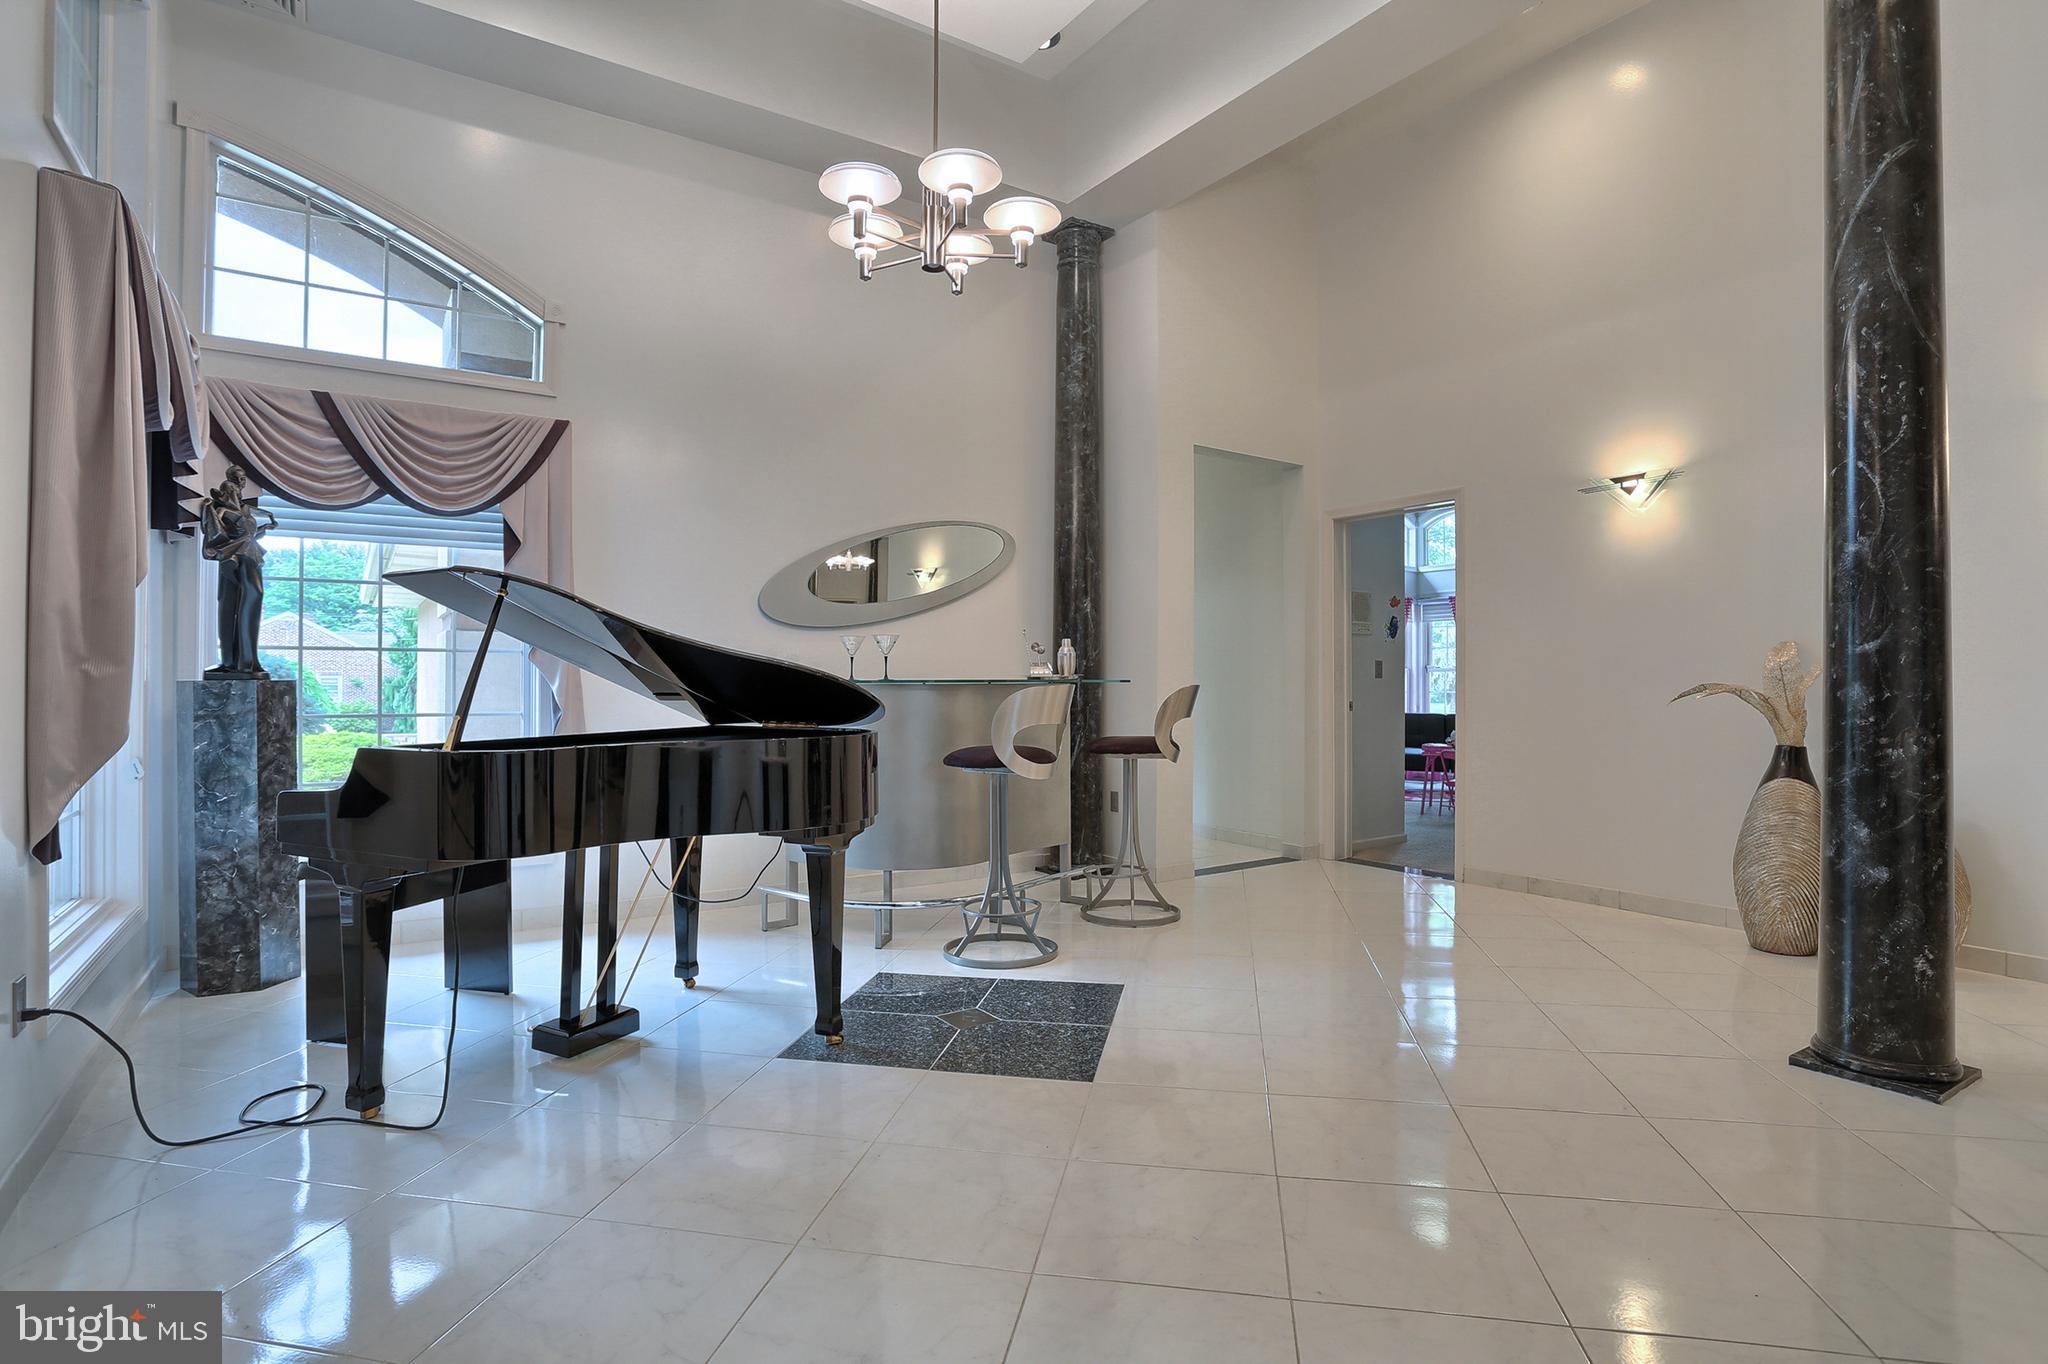 18' x 17' music room off foyer